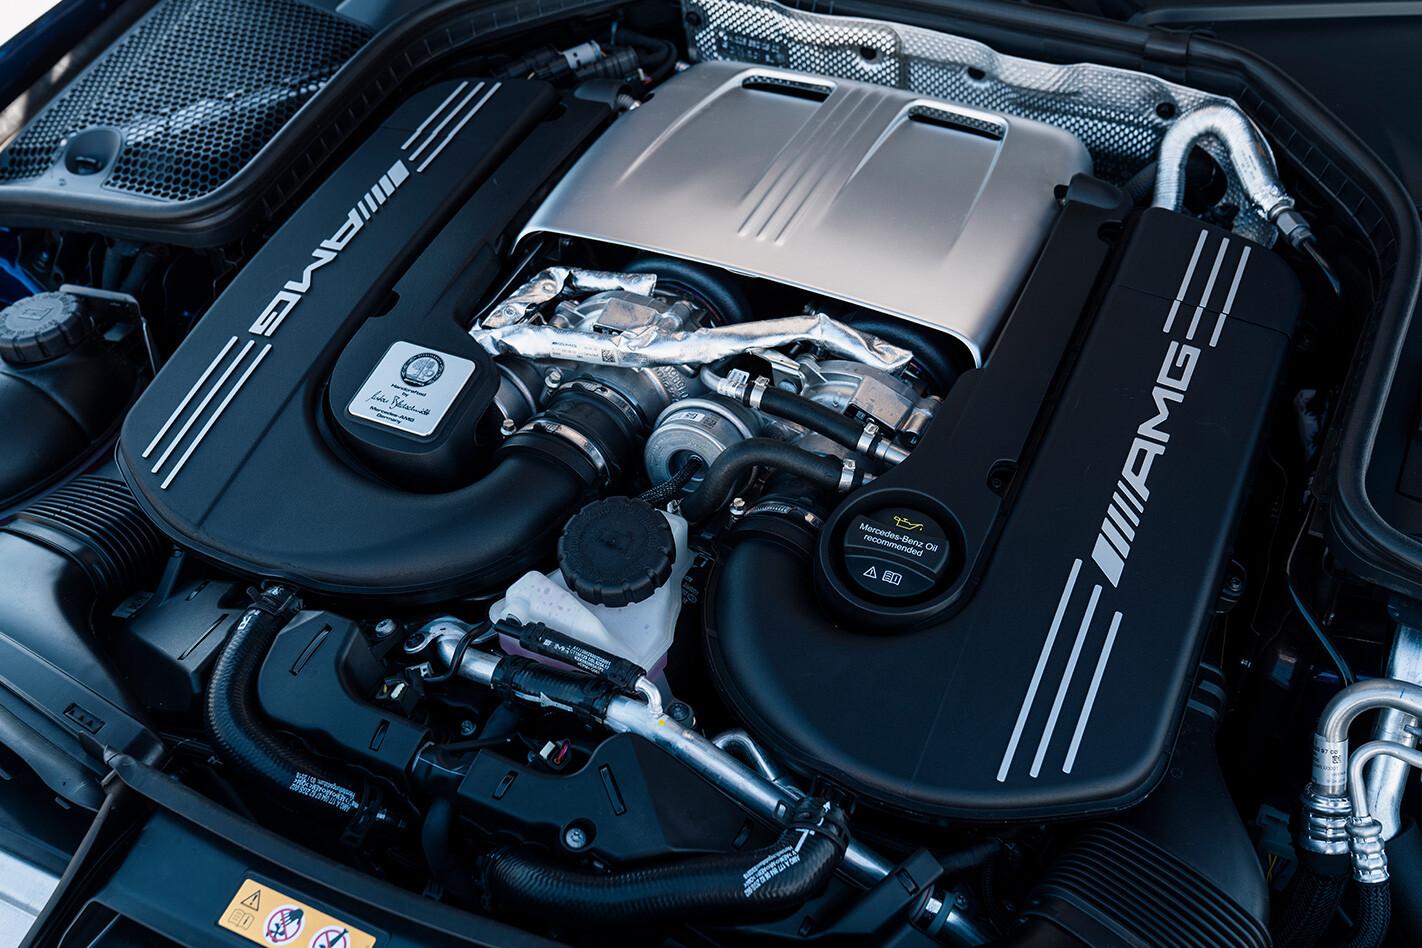 Mercedes Amg C 63 S Engine Jpg